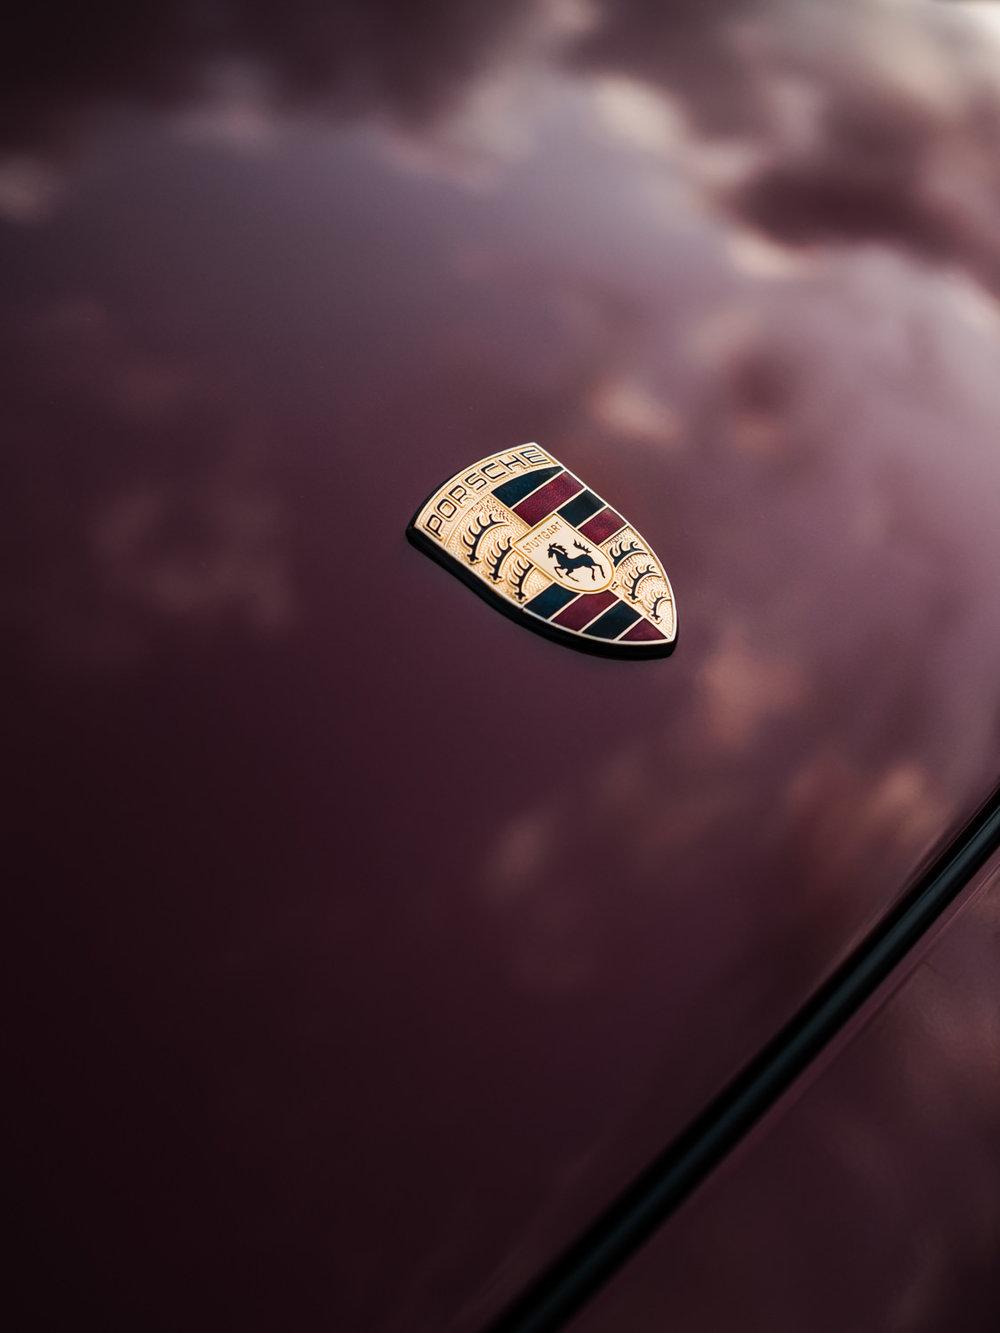 Porsche 911 Carrera 4S-Porsche 993-Porsche 911-Paint Correction-Car Wash-Car Detailing-119.jpg